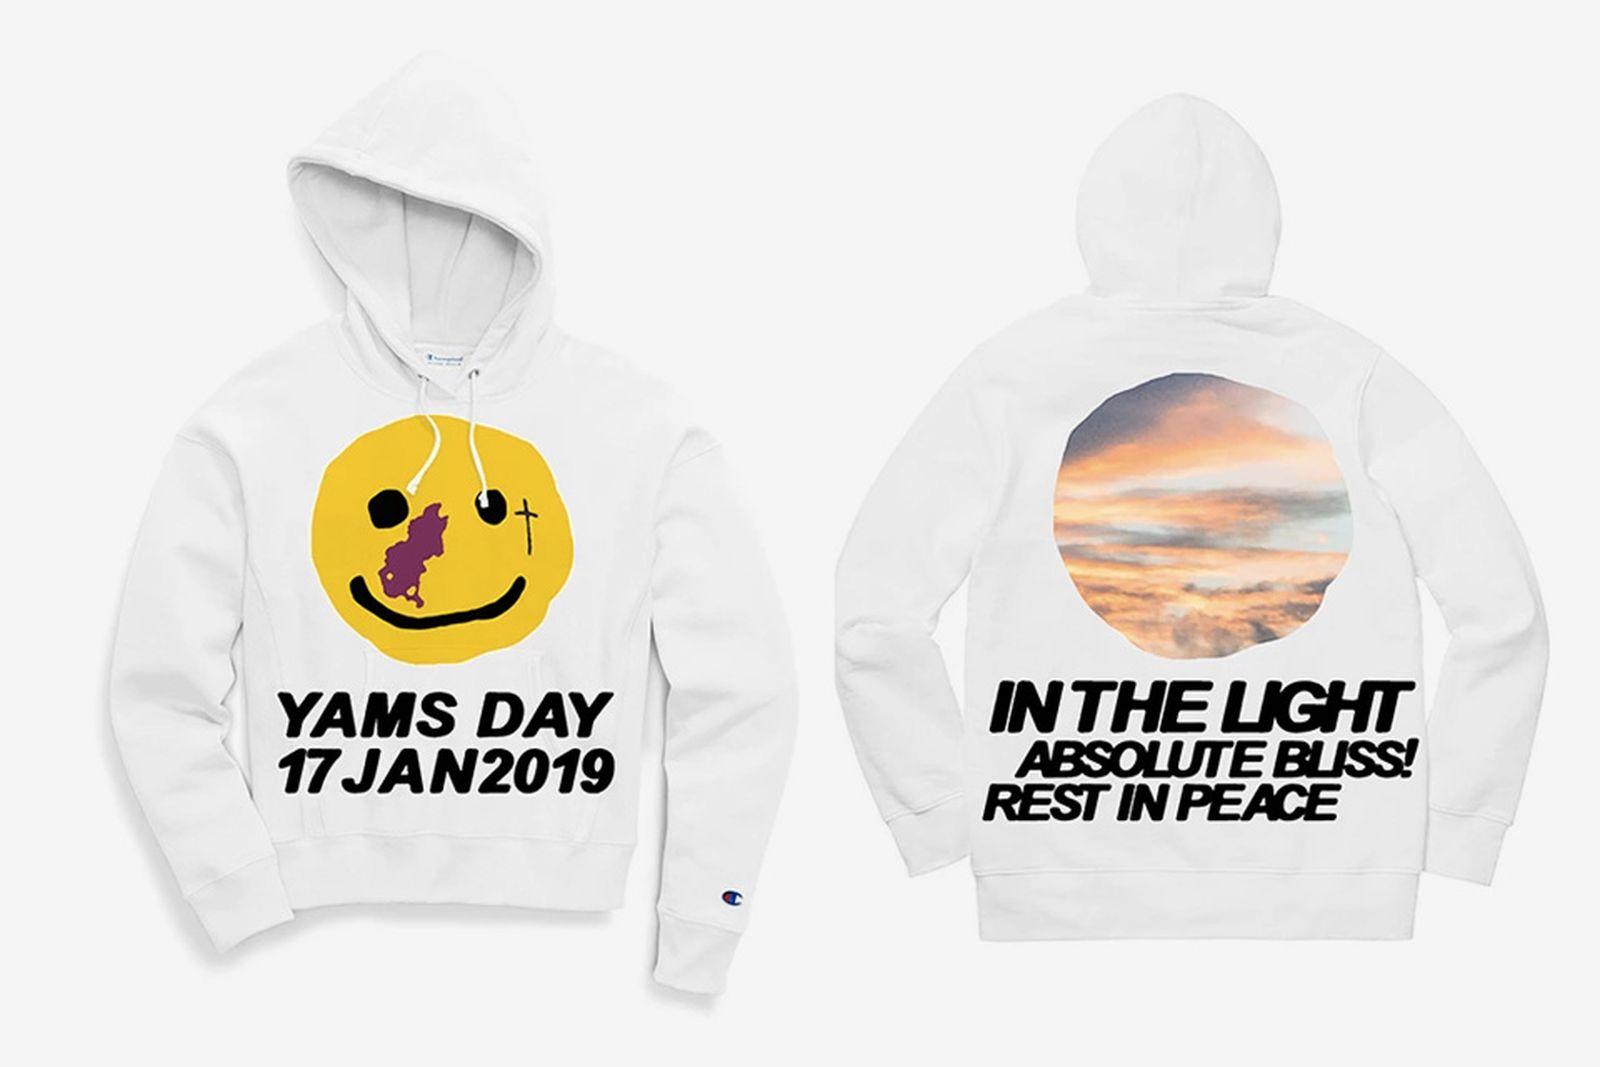 yams day merch 2019 A$AP Yams Day 2019